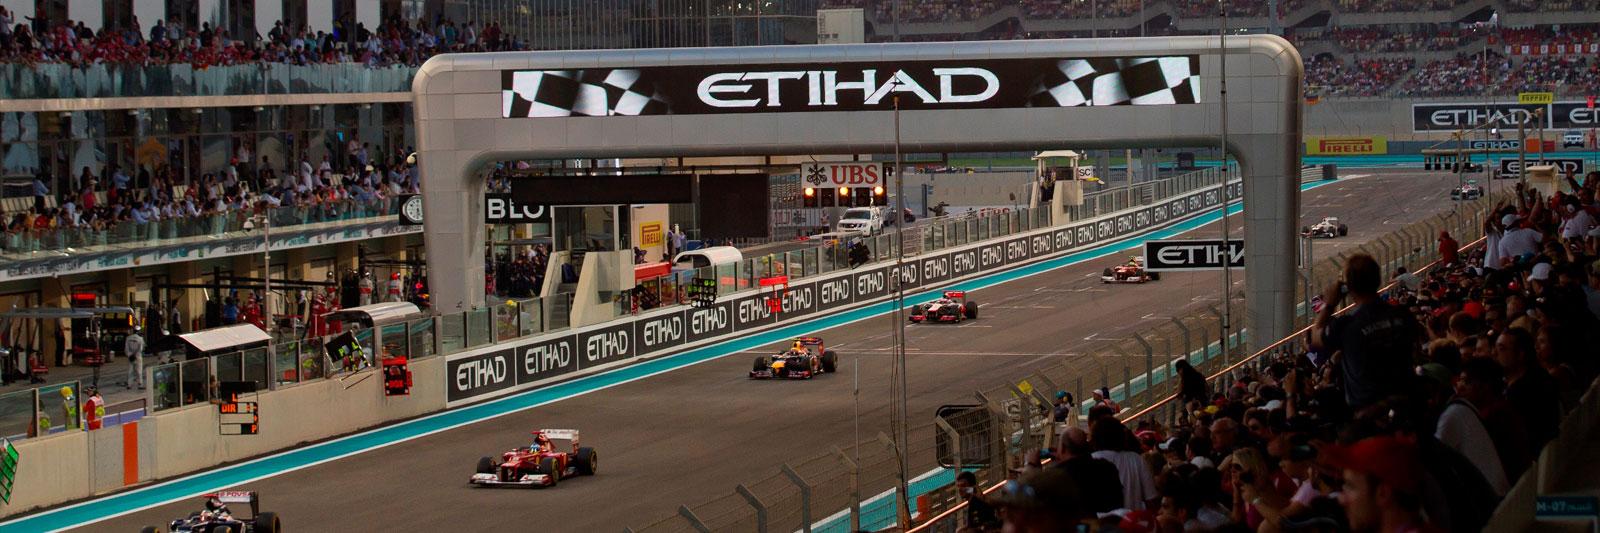 Abu Dhabi Grand Prix with Grand Prix Tours.